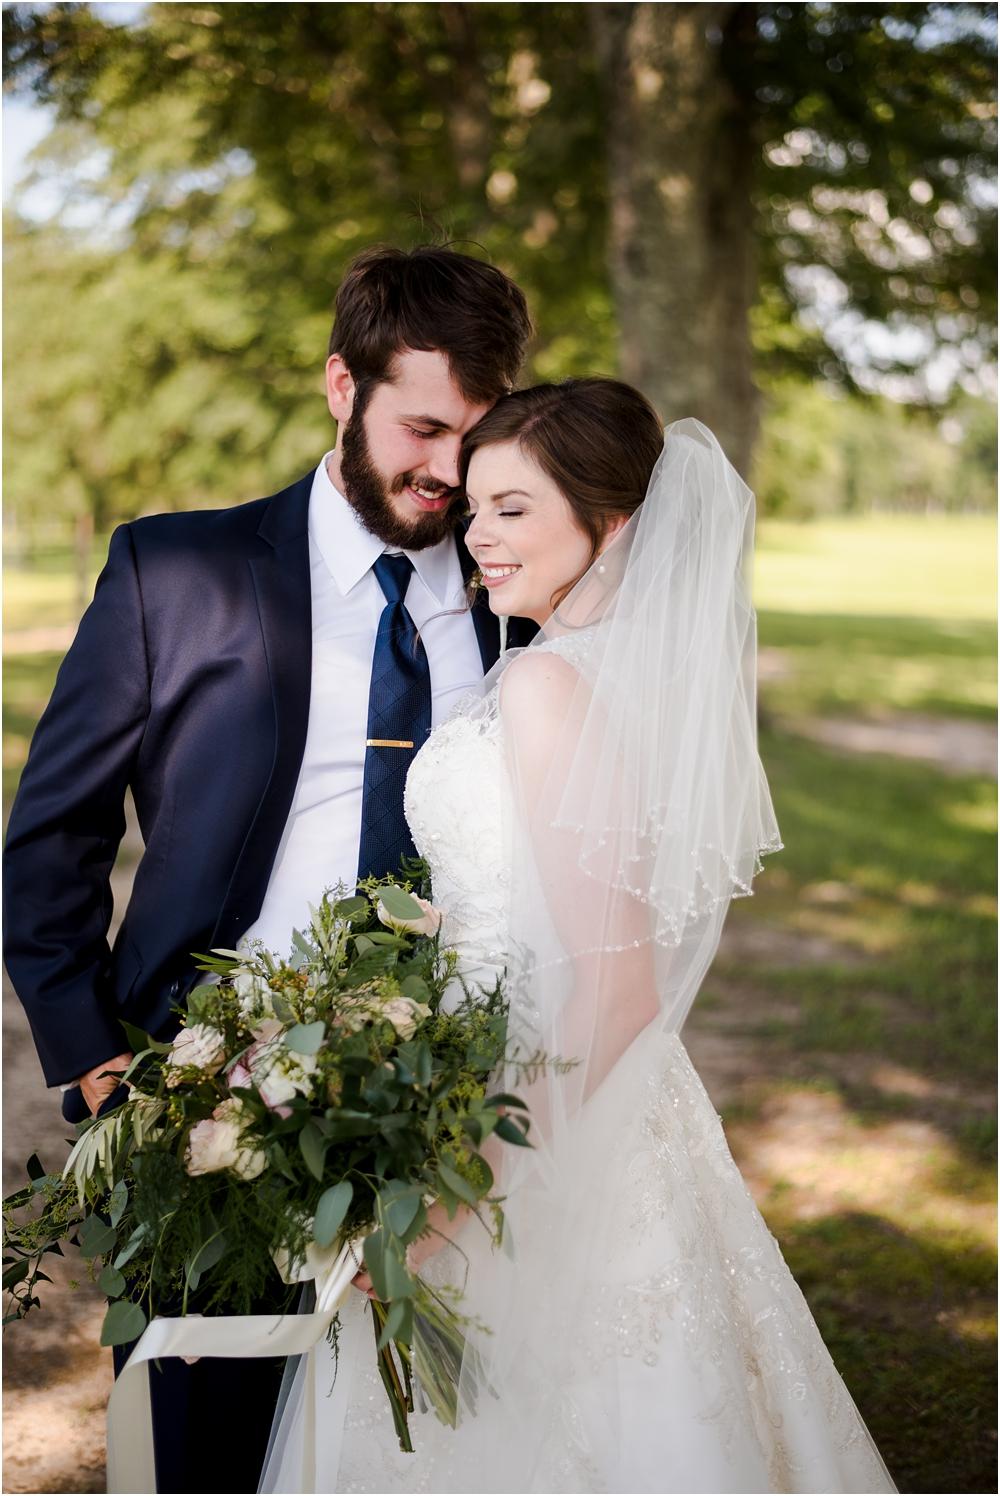 marianna-florida-wedding-photographer-kiersten-grant-58.jpg